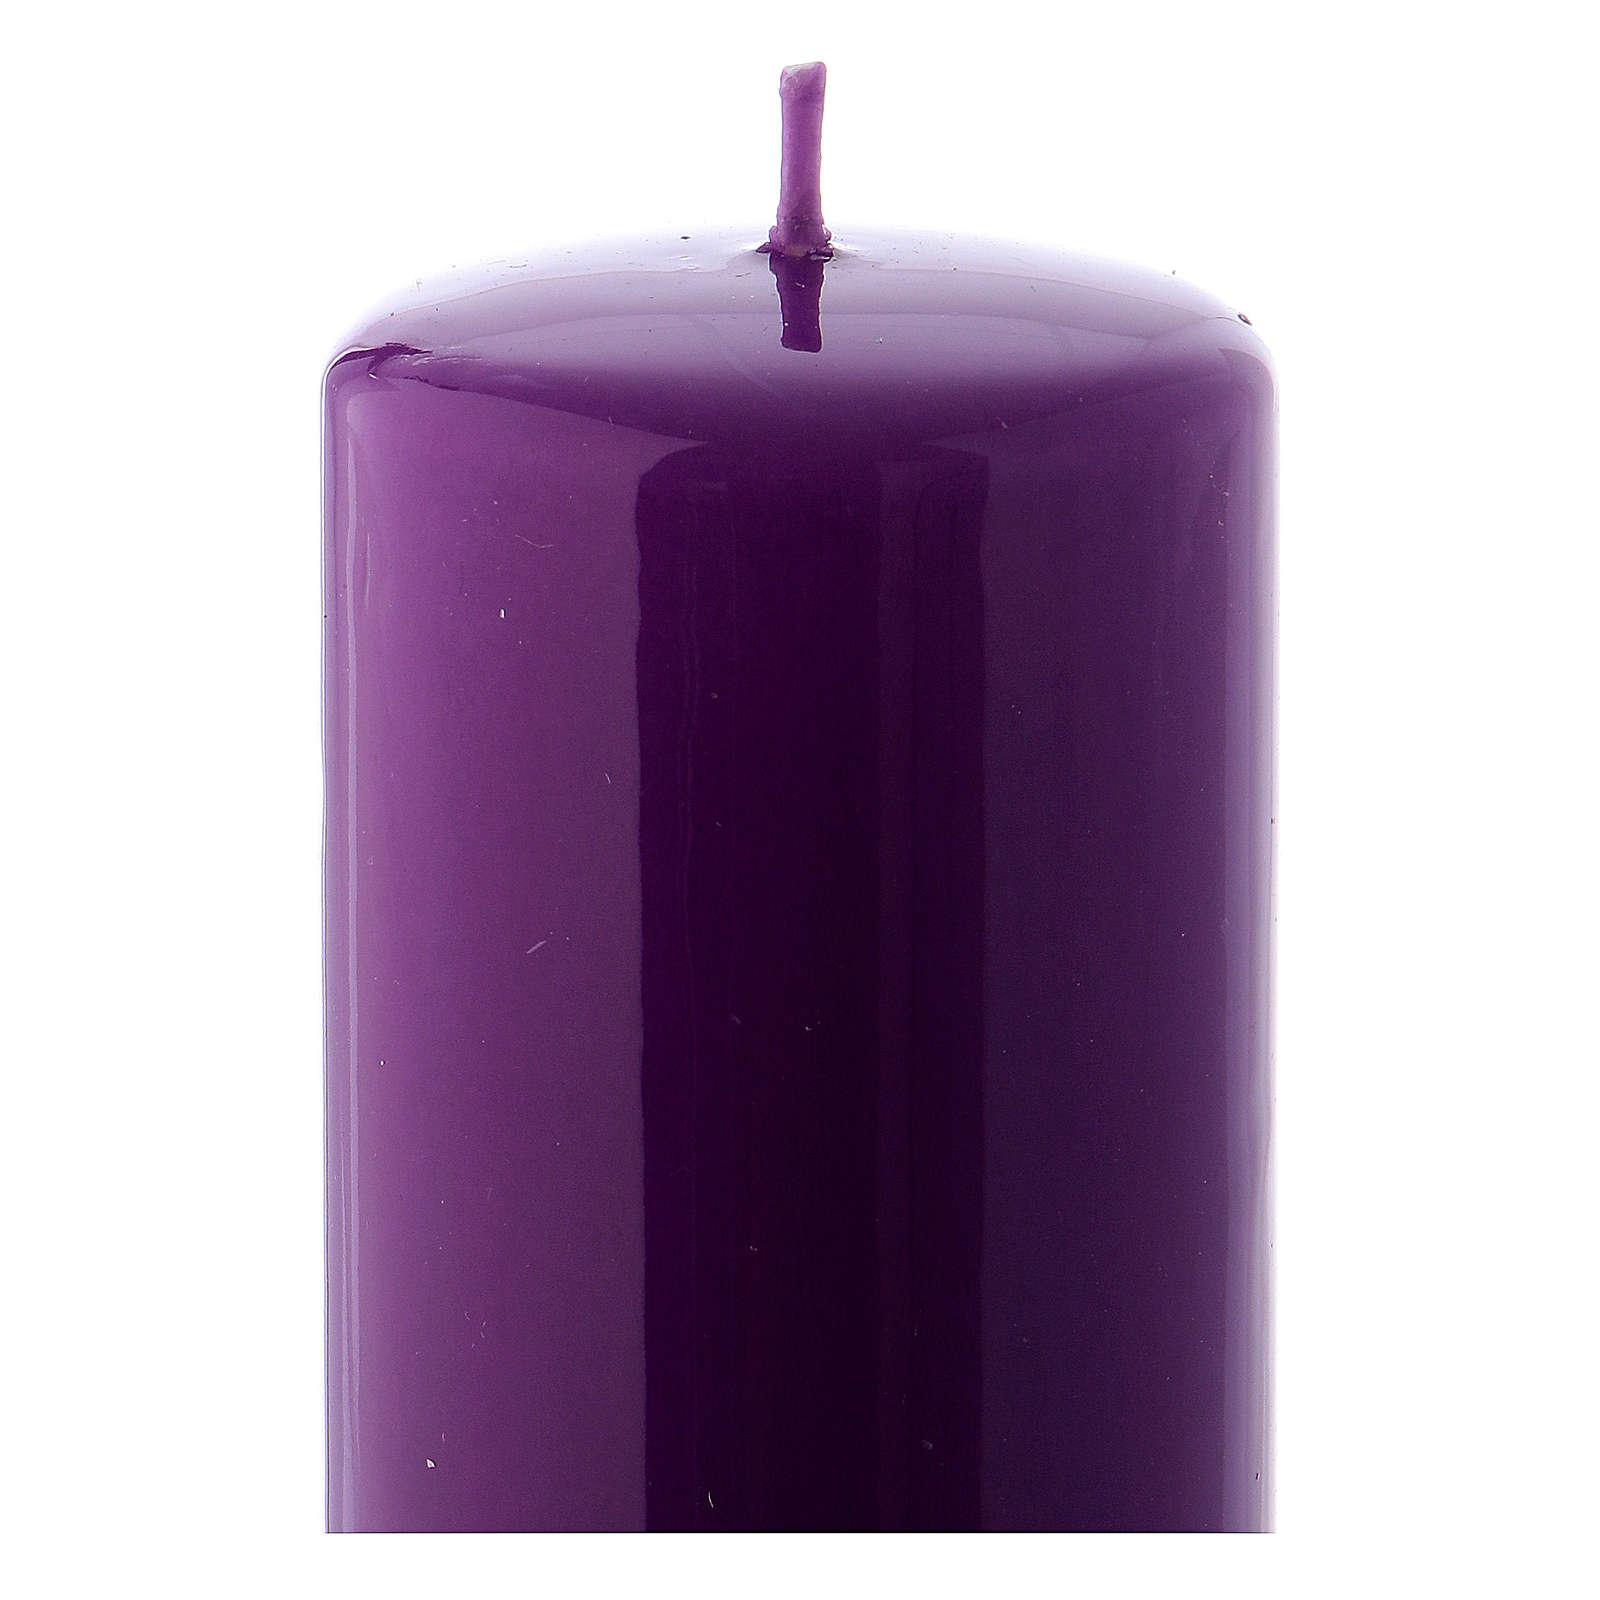 Kerze Siegellack violett 6x15cm 3